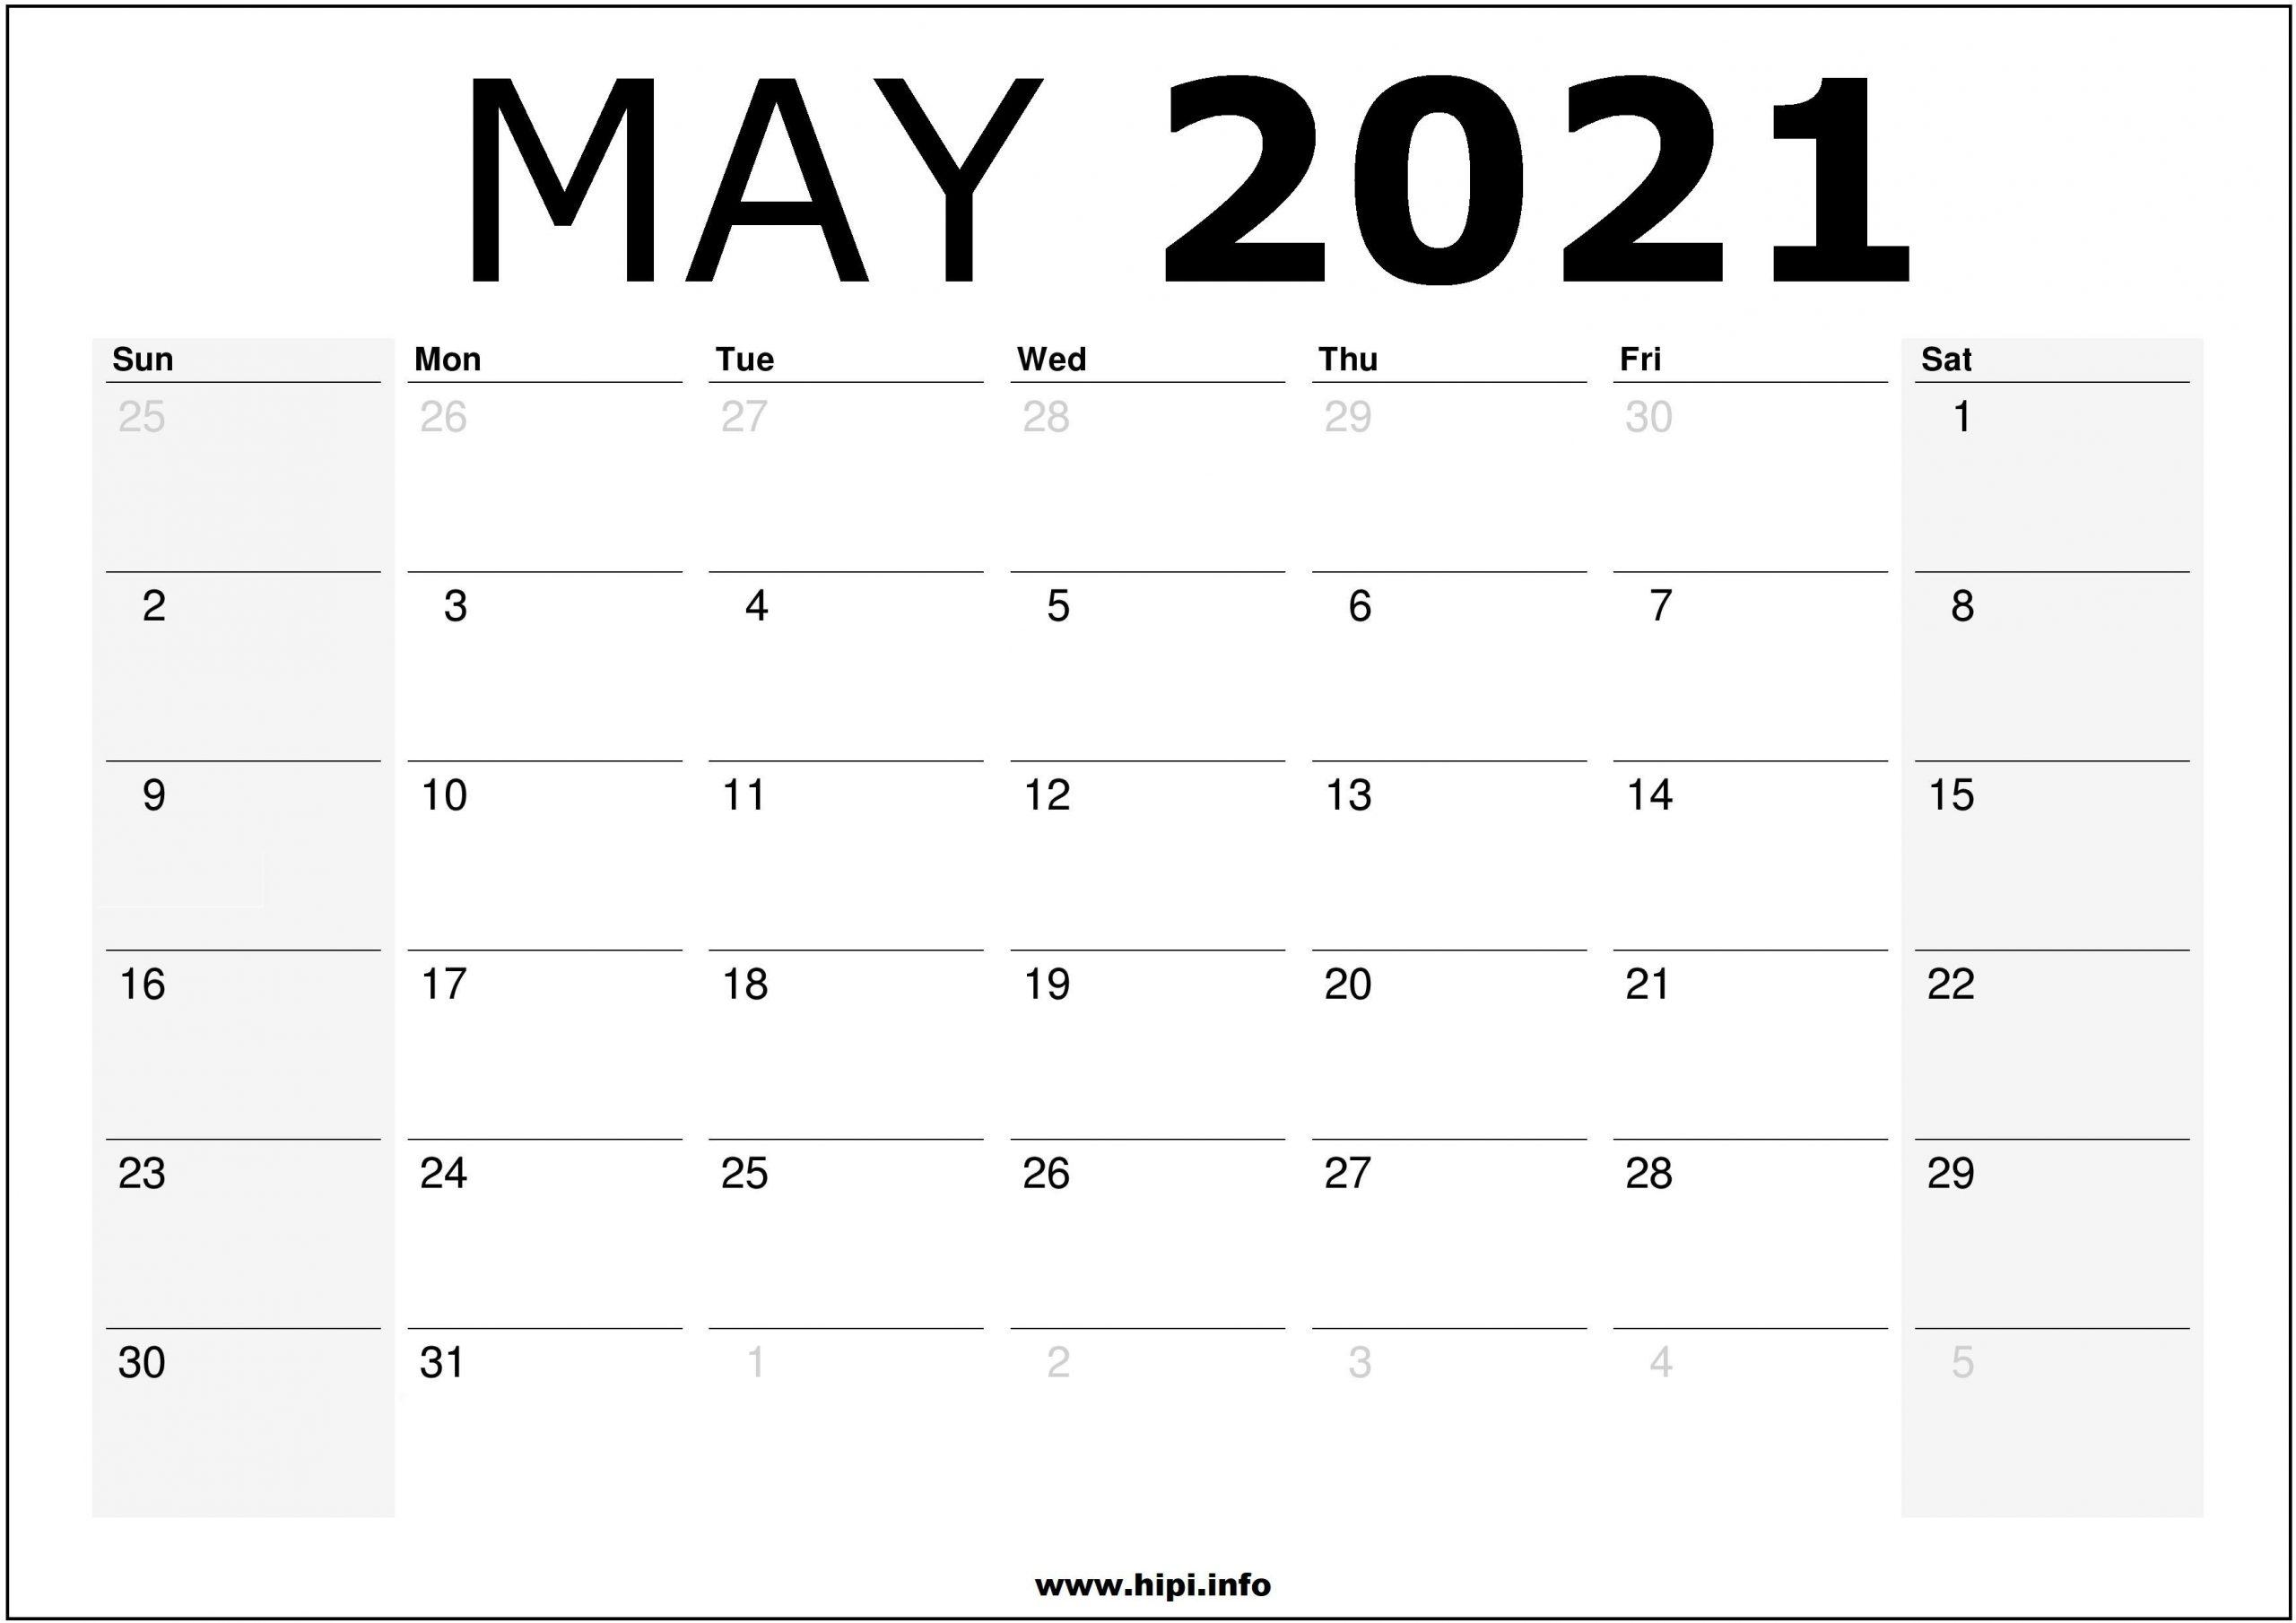 May 2021 Calendar Wallpapers - Top Free May 2021 Calendar